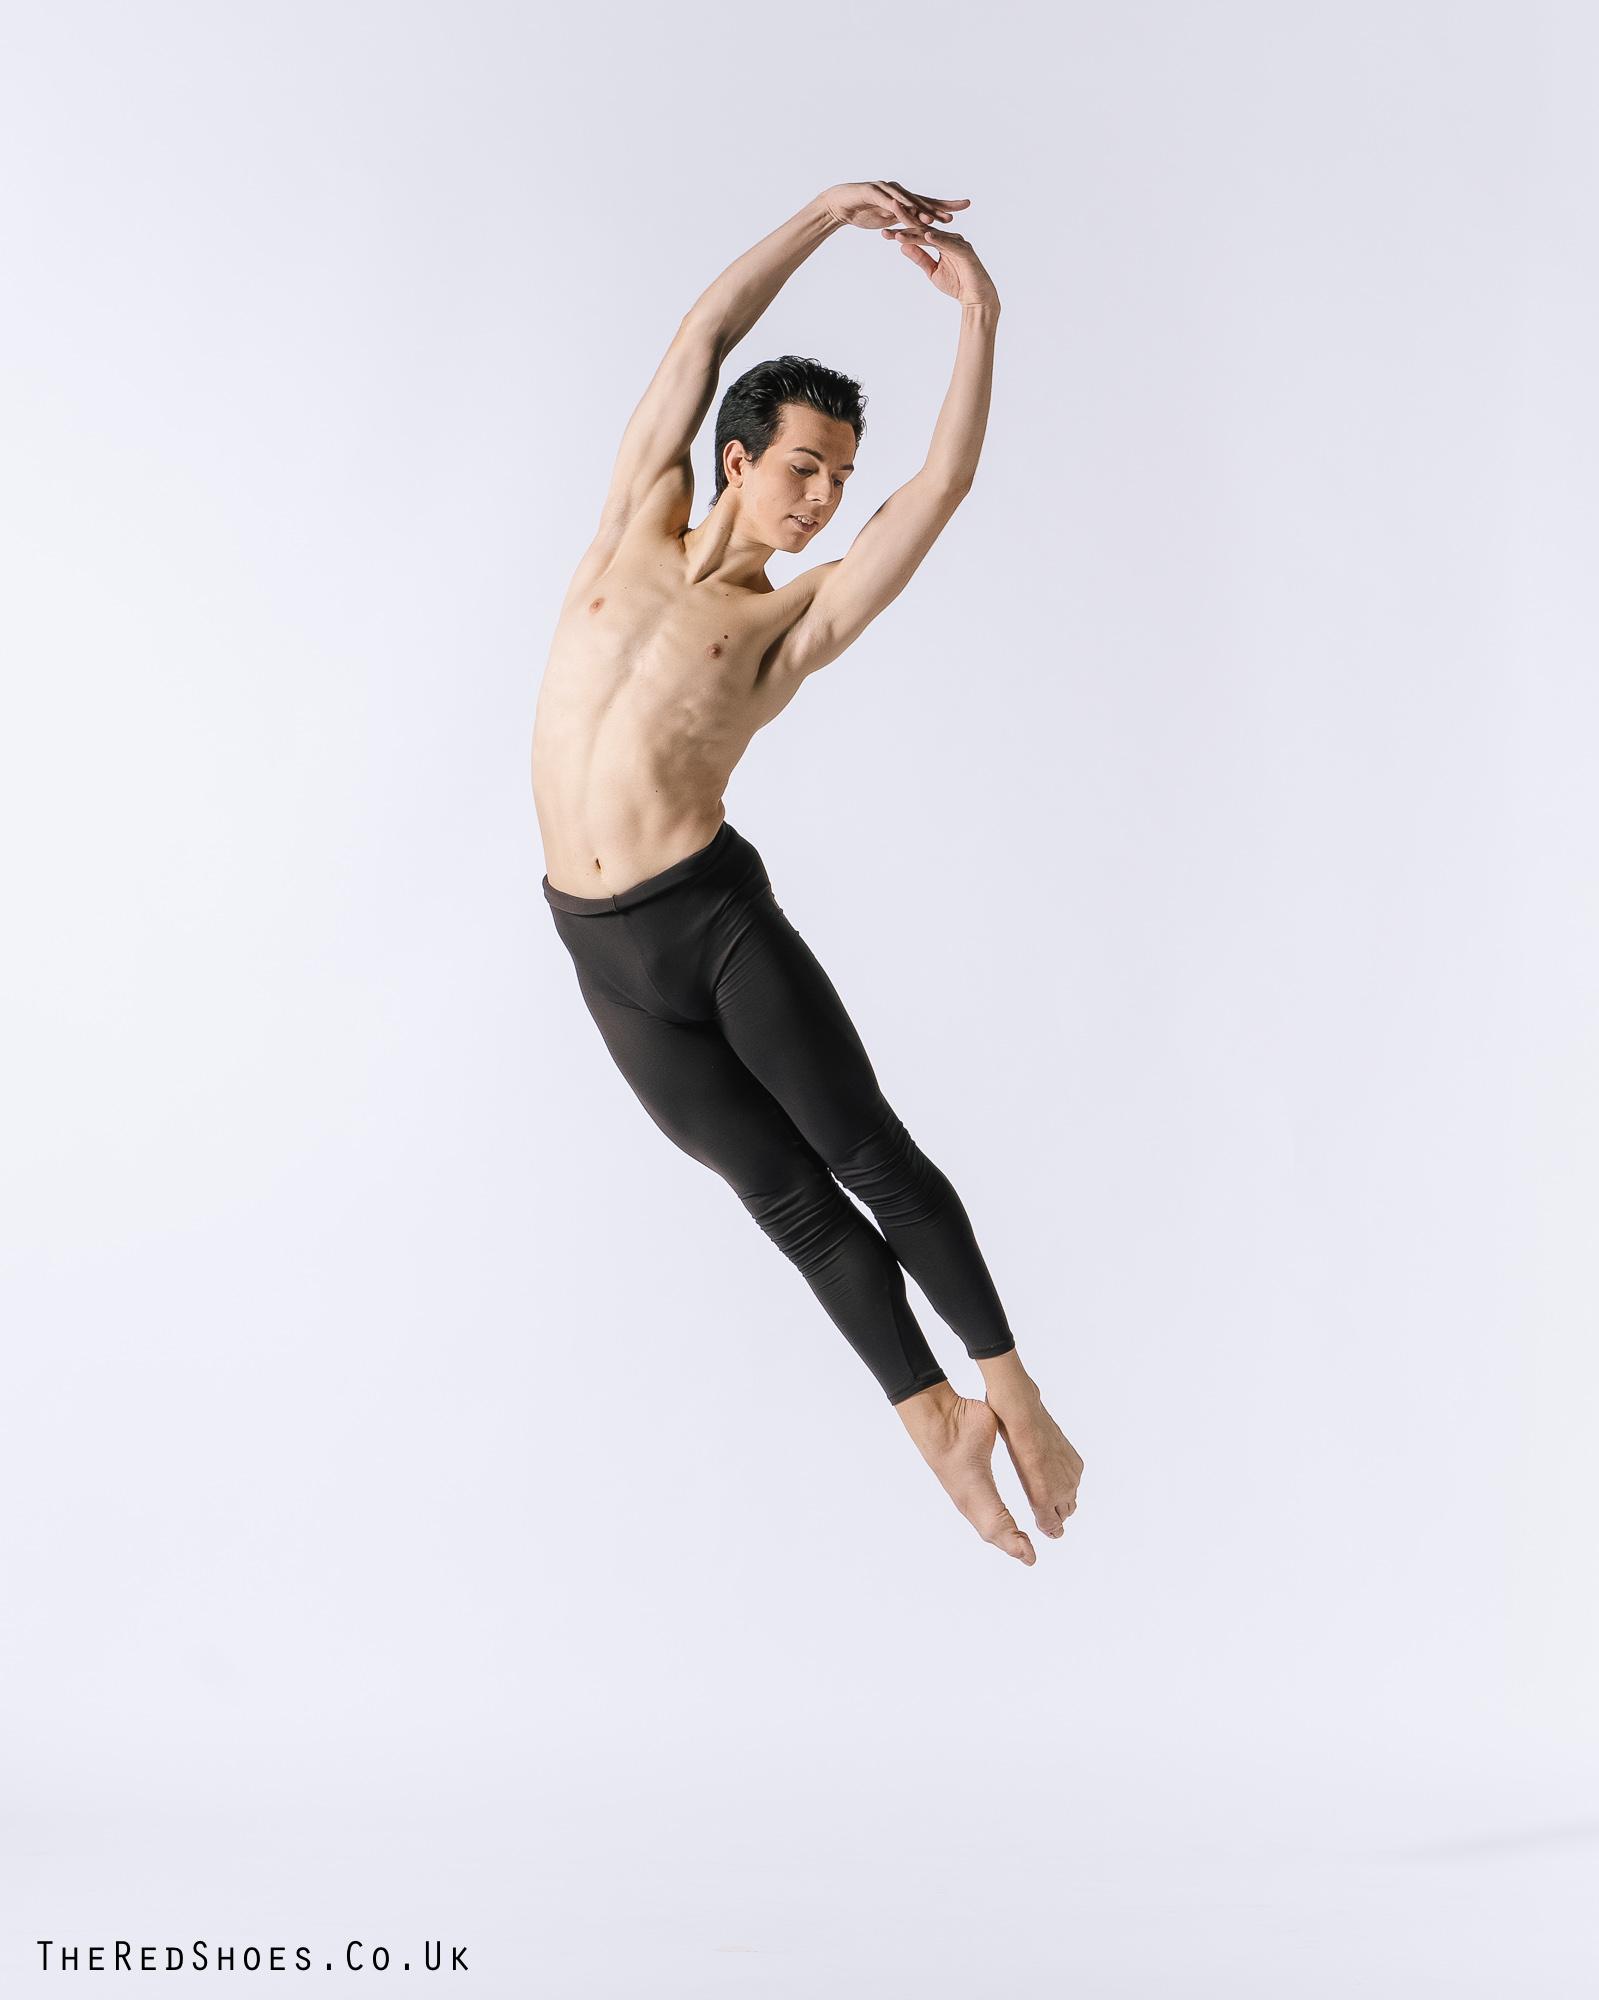 dance-photography-25.jpg